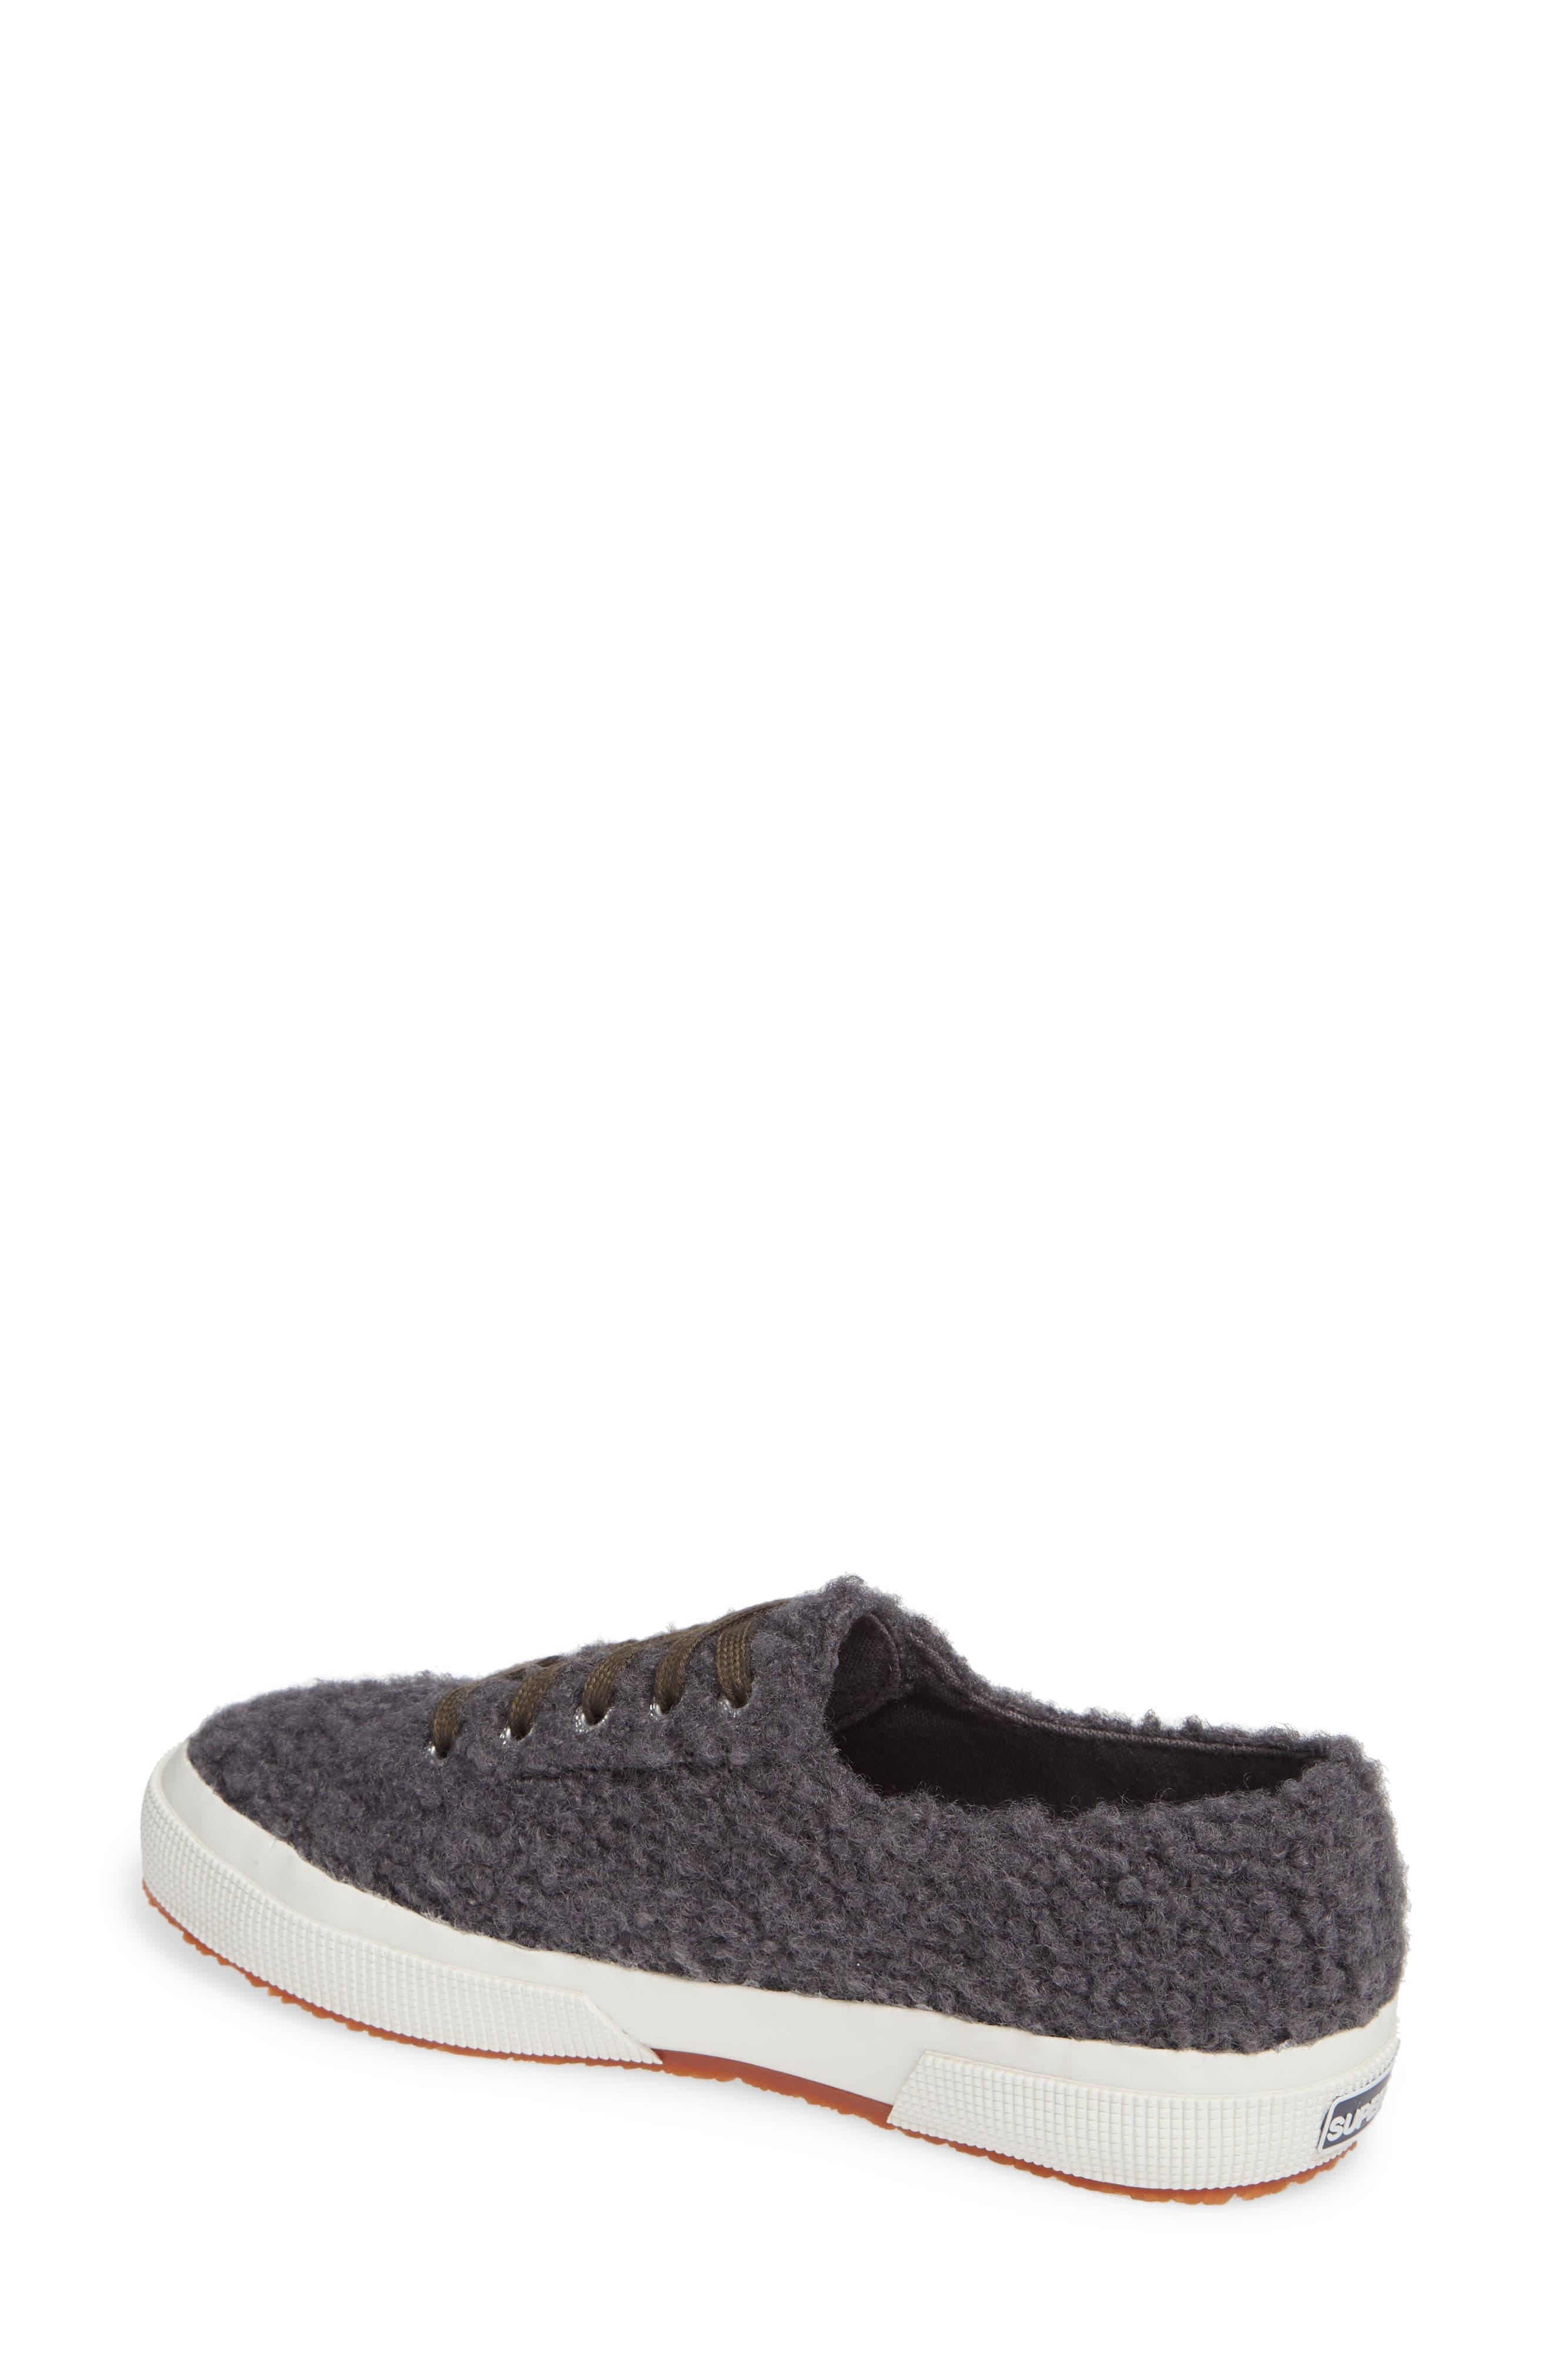 2759 Curly Wool Sneaker,                             Alternate thumbnail 2, color,                             DARK GREY/ GREY